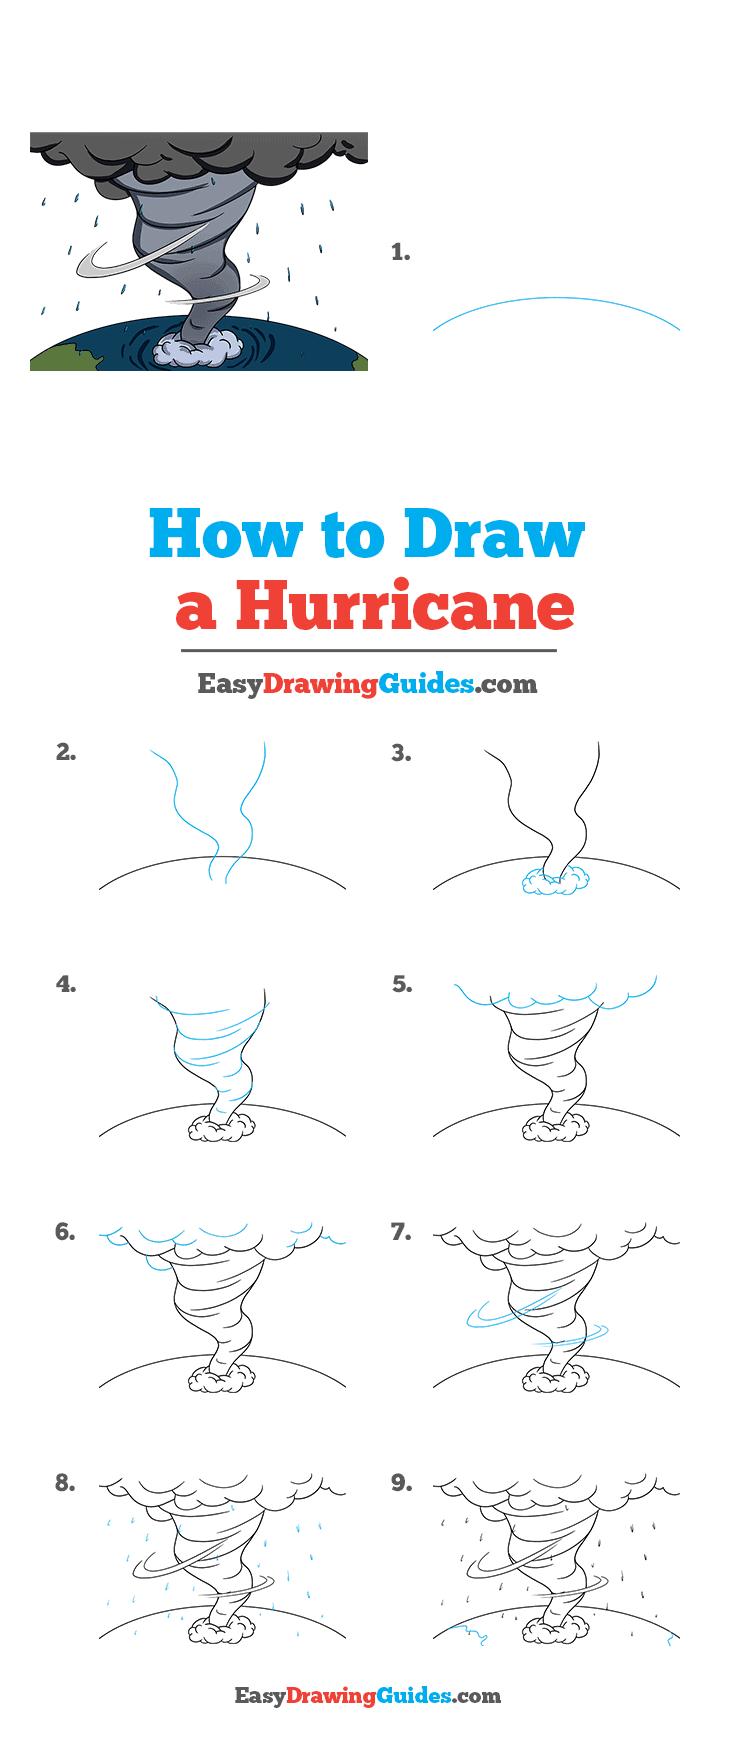 How to Draw Hurricane